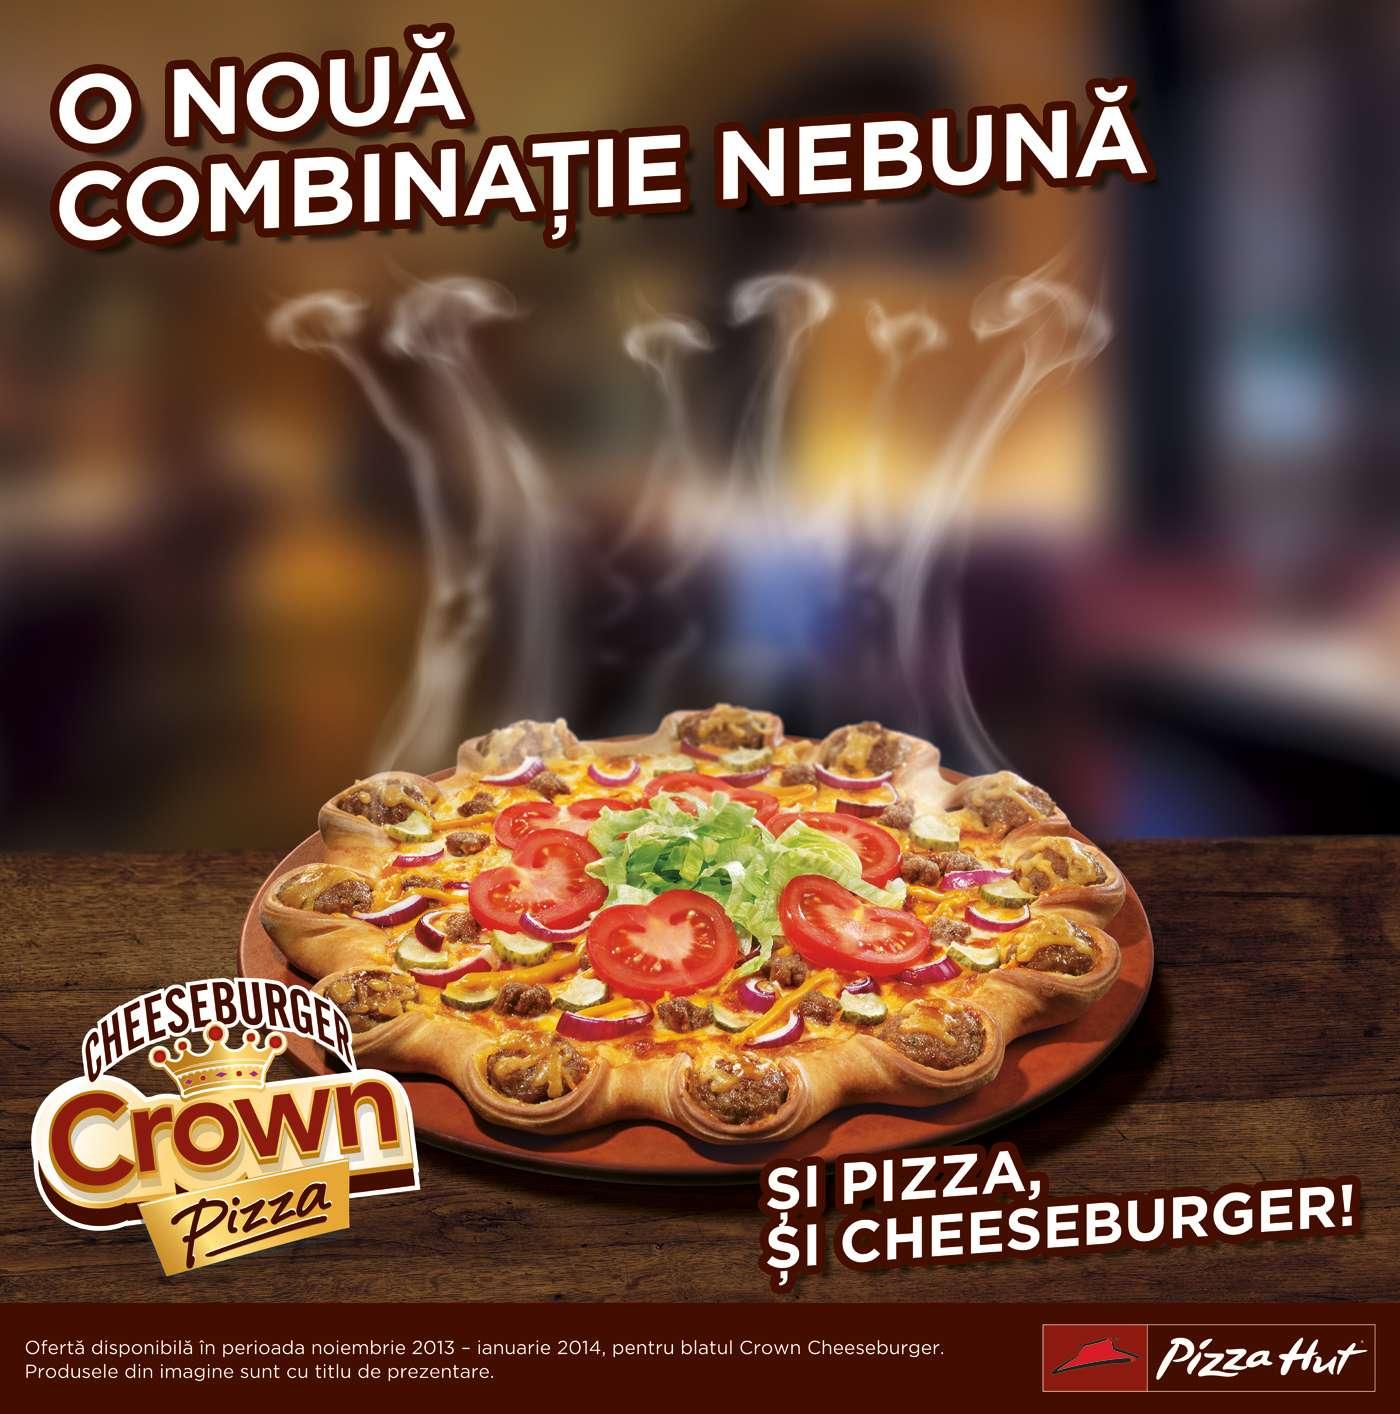 Crown Cheeseburger Pizza Hut